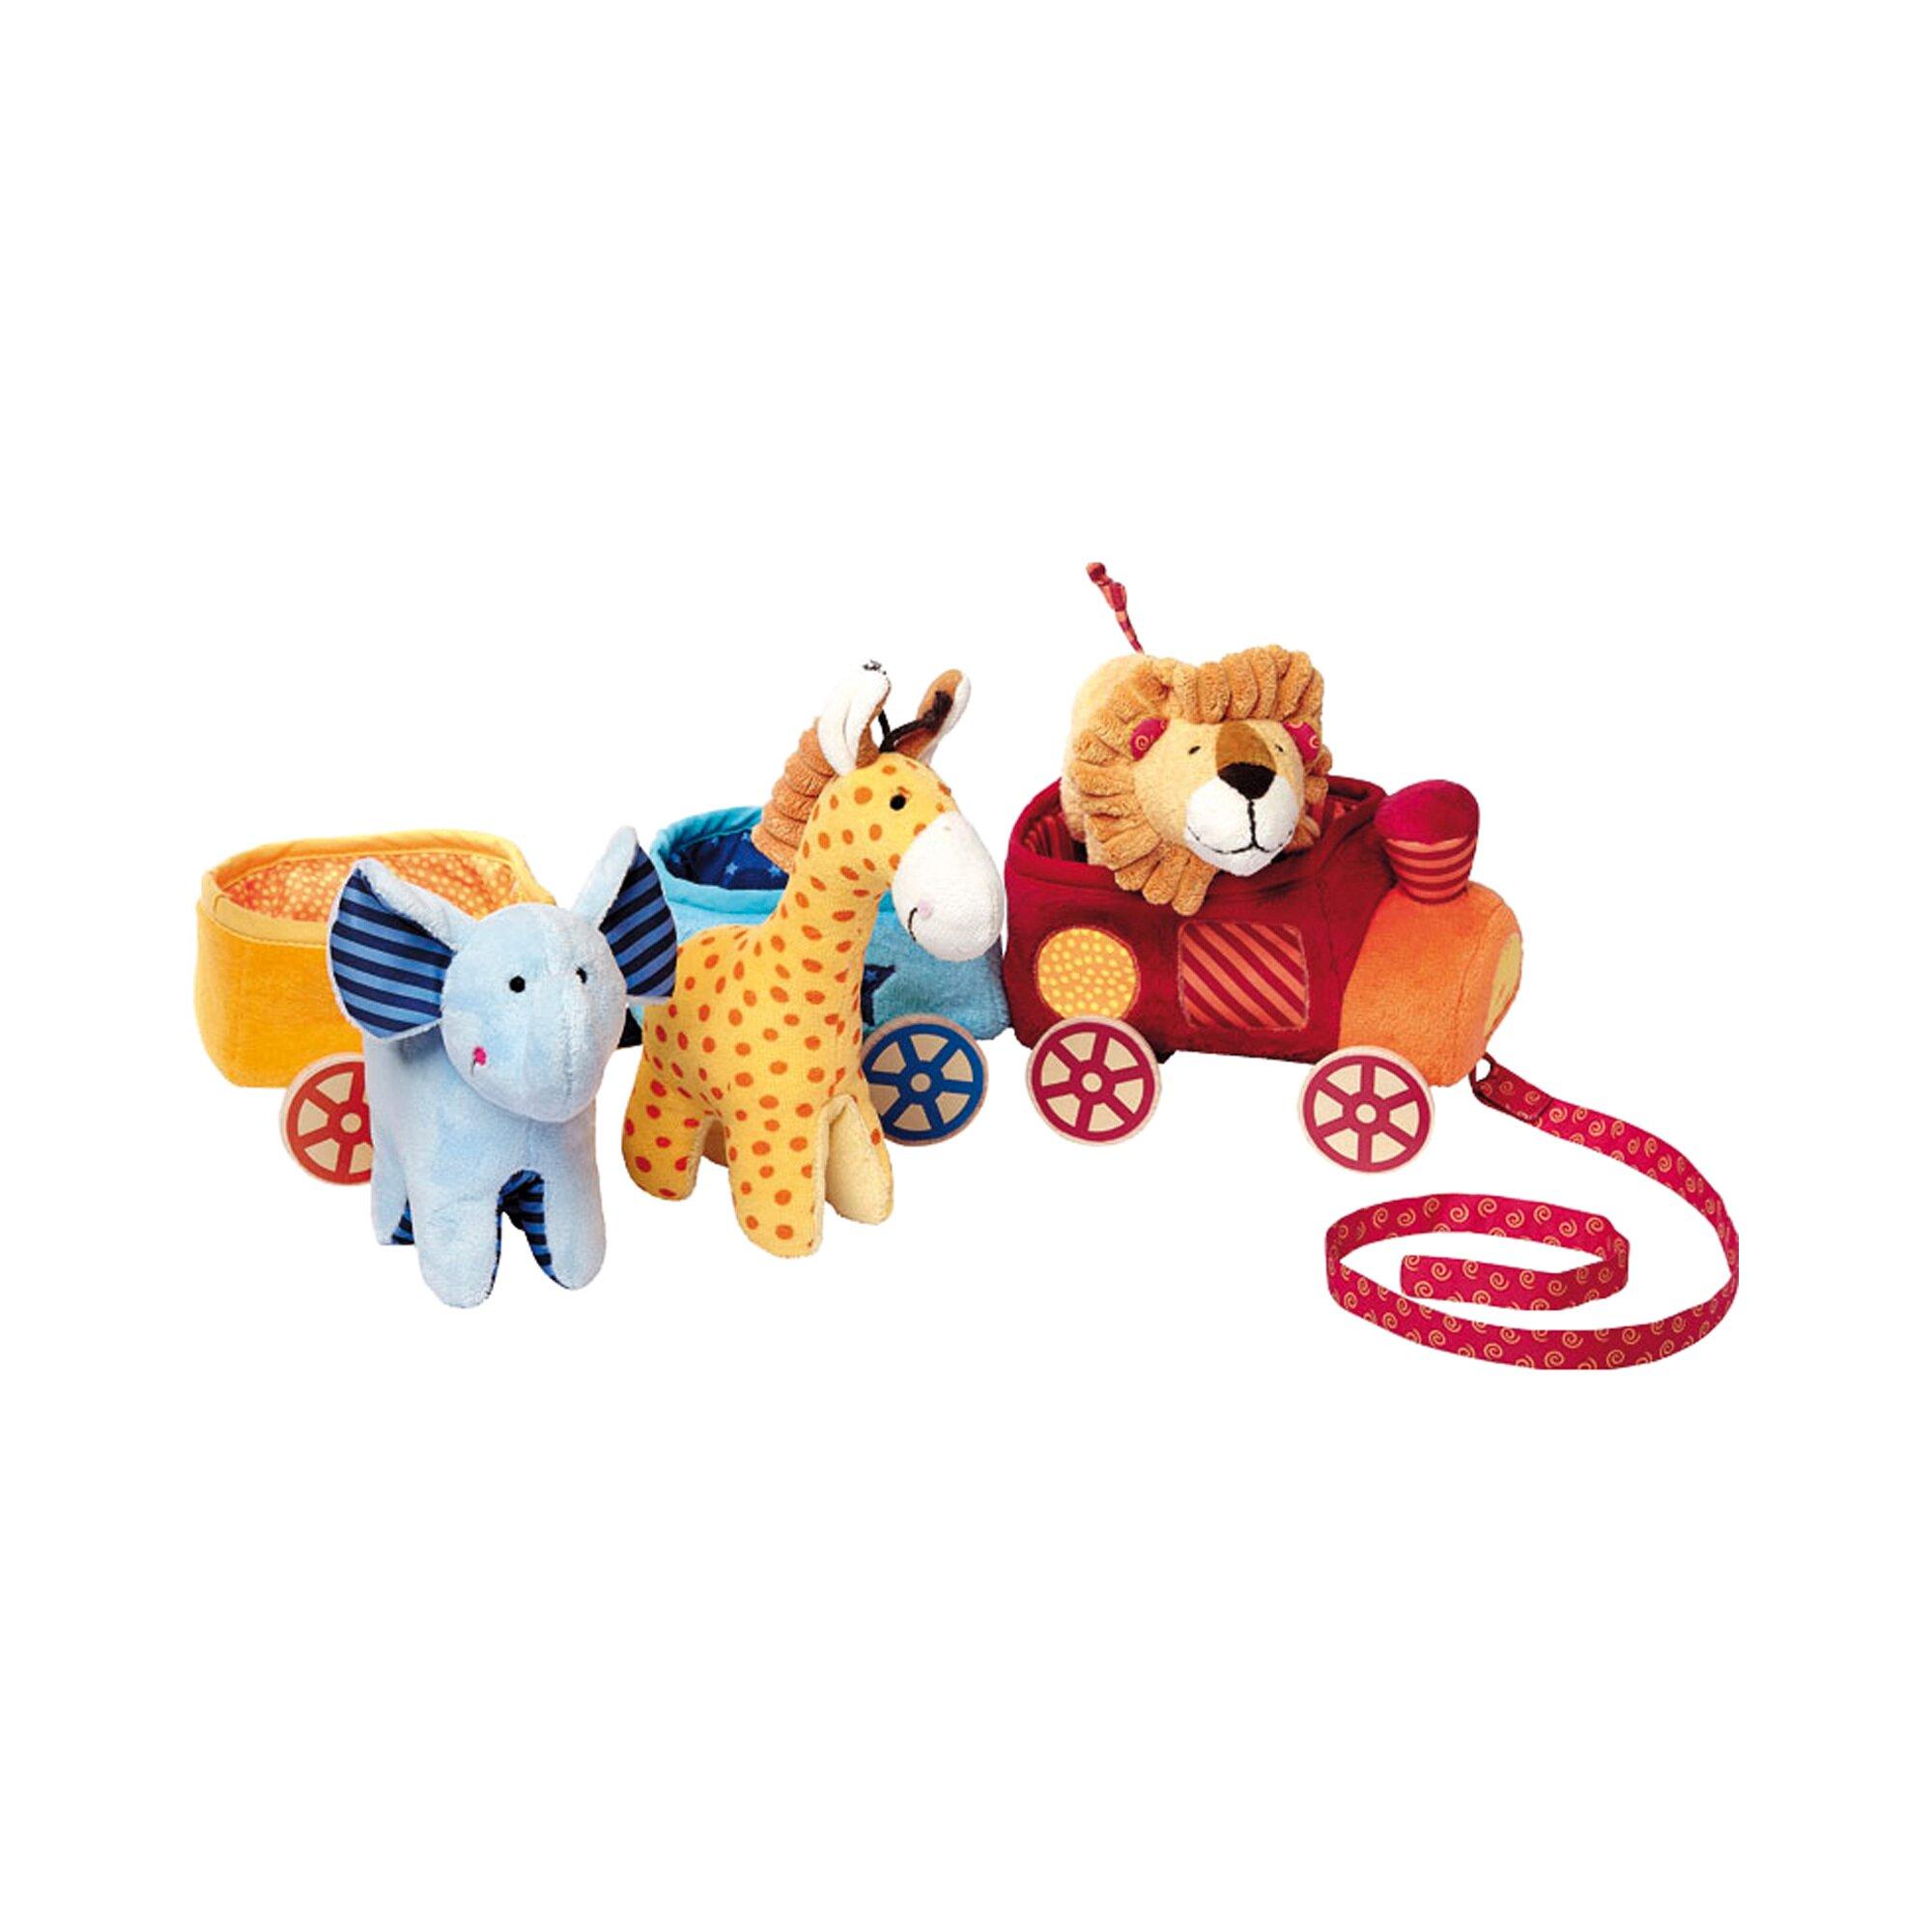 sigikid-stoffspielzeug-nachzieh-safari-zug